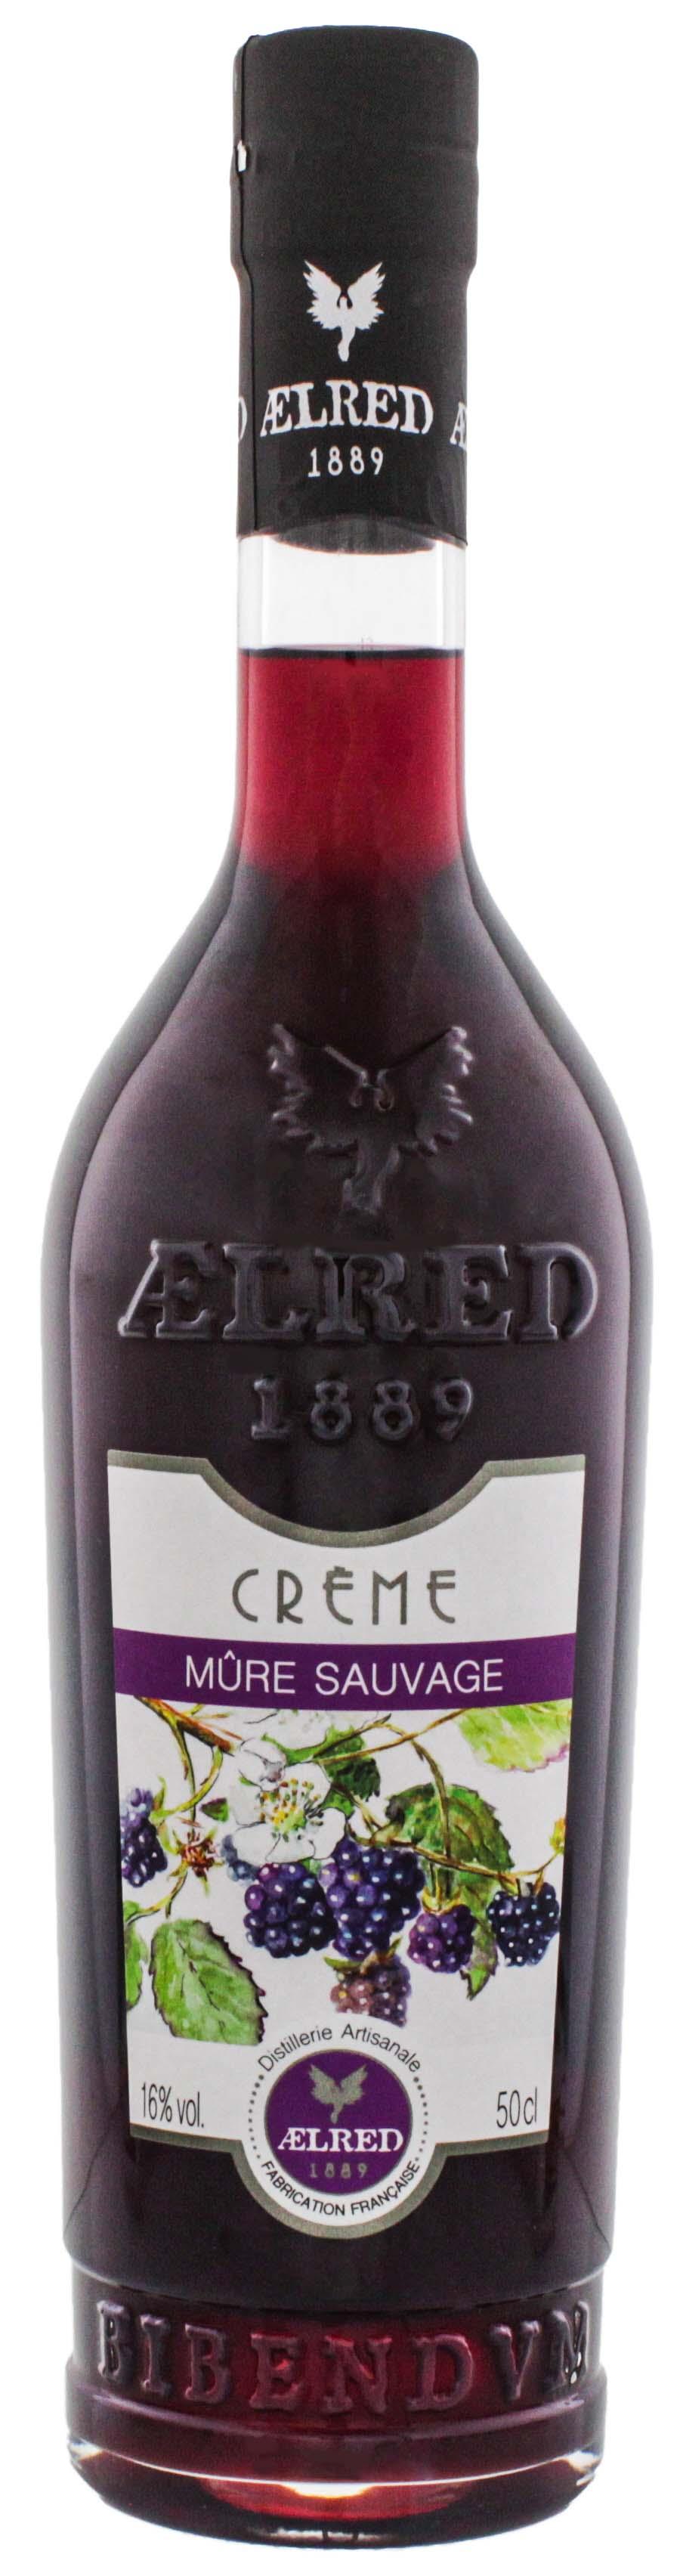 Aelred liqueur 1889 Creme de Mûre Sauvage  (Brombeere) 0,5L 16%